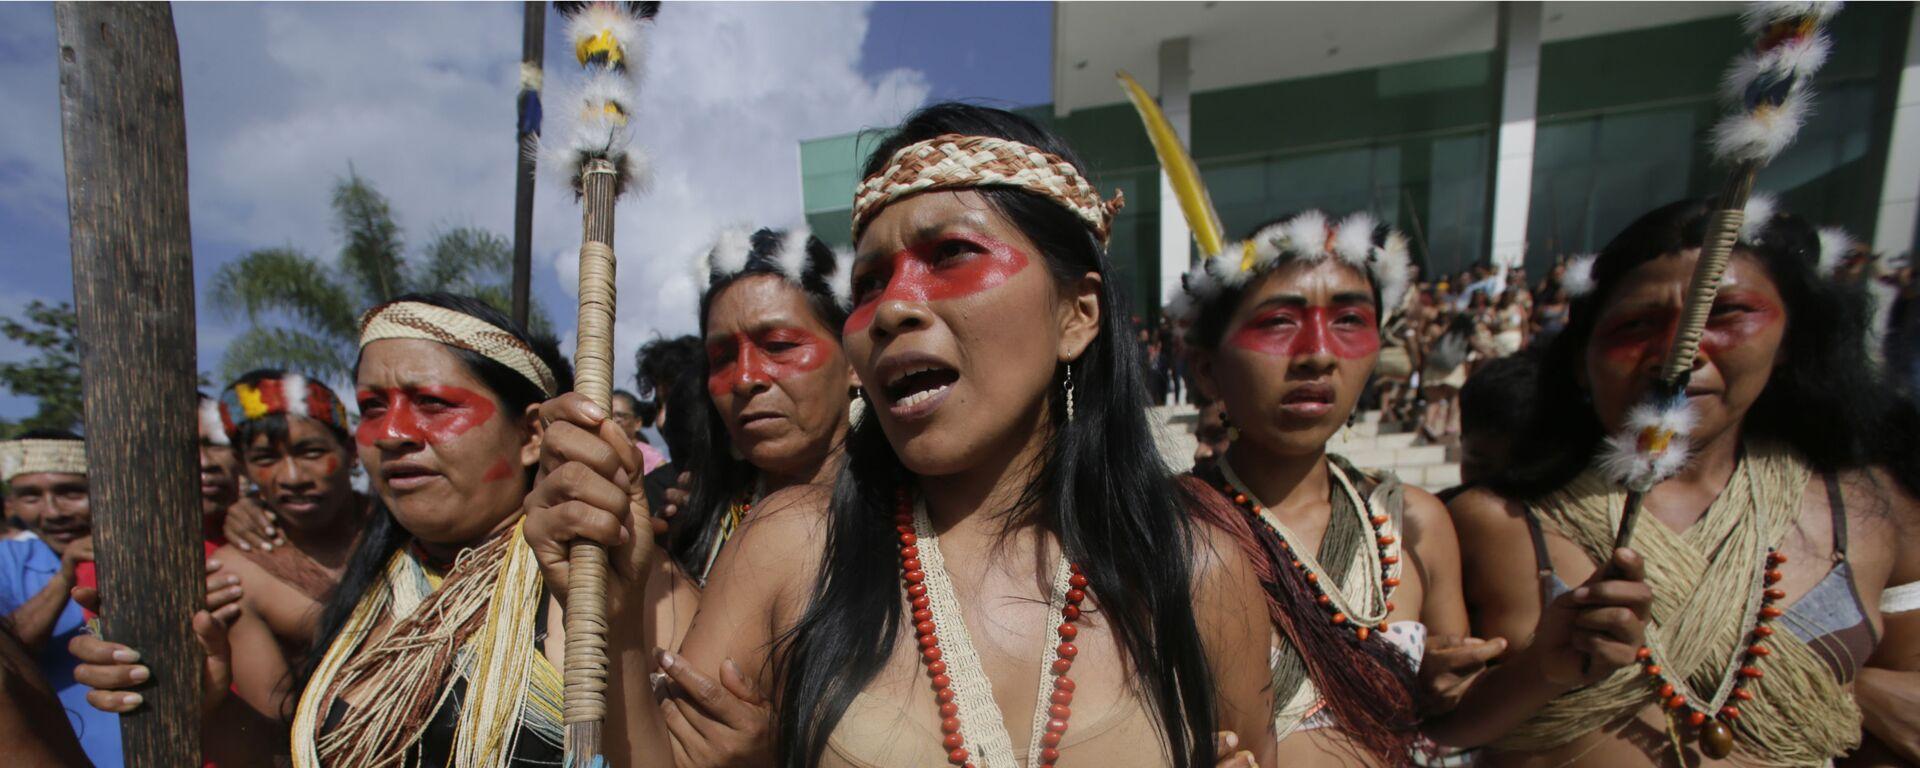 Nemonte Nenquimo, líder indígena del pueblo Waorani - Sputnik Mundo, 1920, 07.06.2021